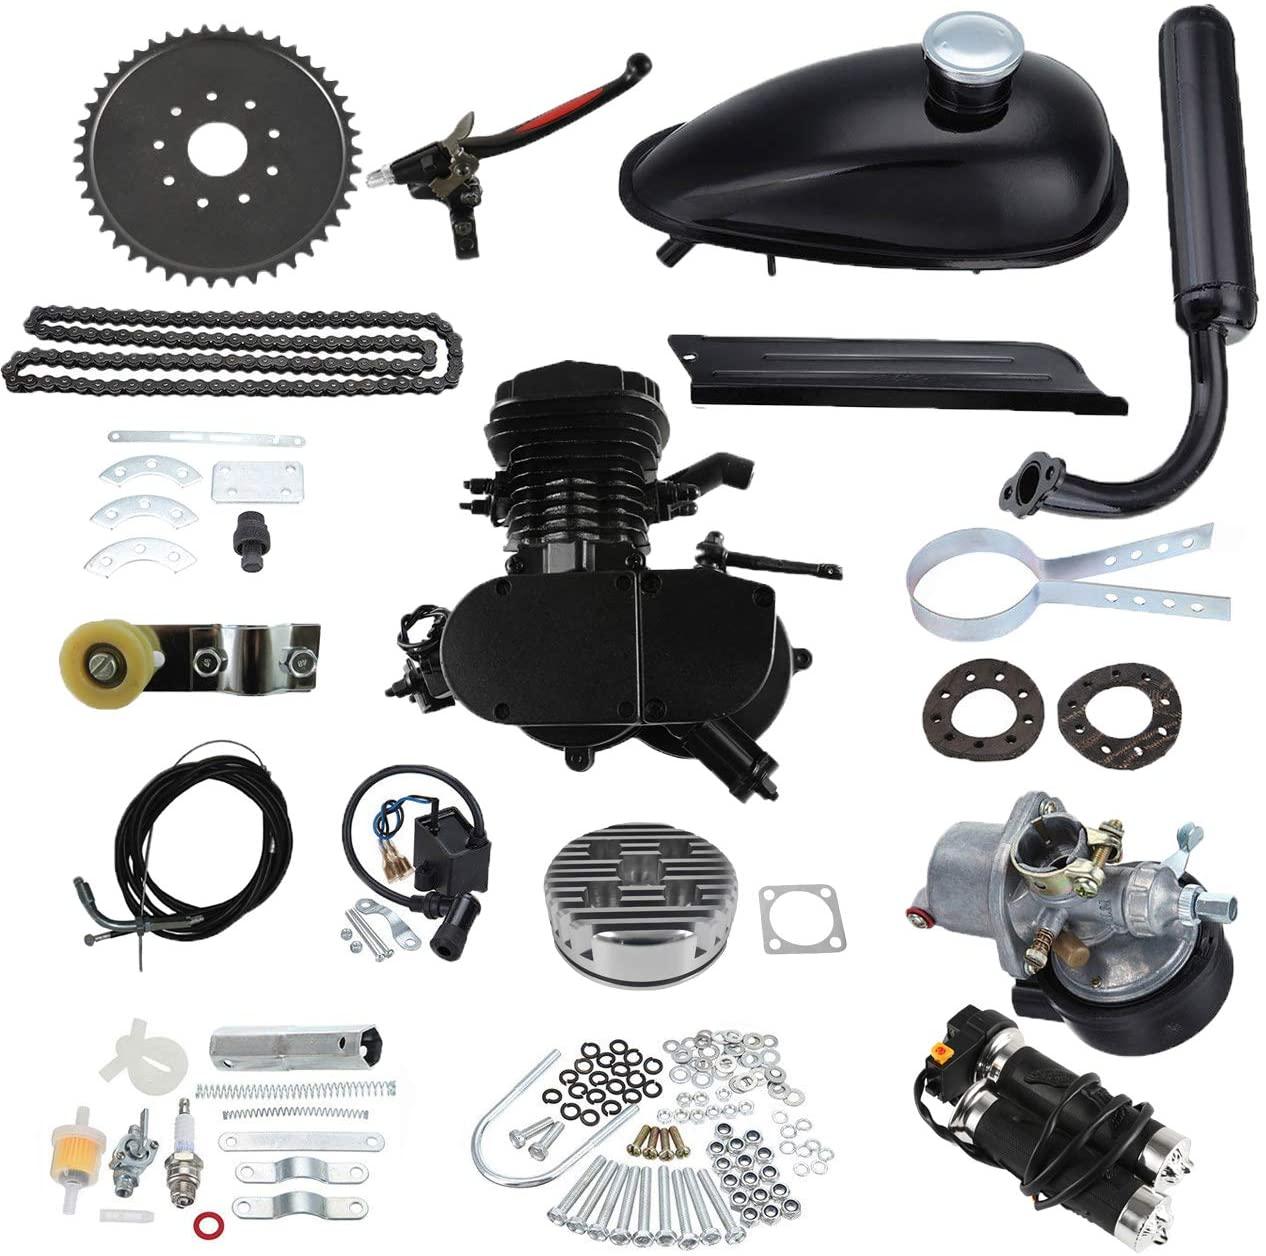 JRL 2 Stroke Petrol Gas Motor 80cc Cycle Bike Motorized Engine Kit For Motor Bicycle